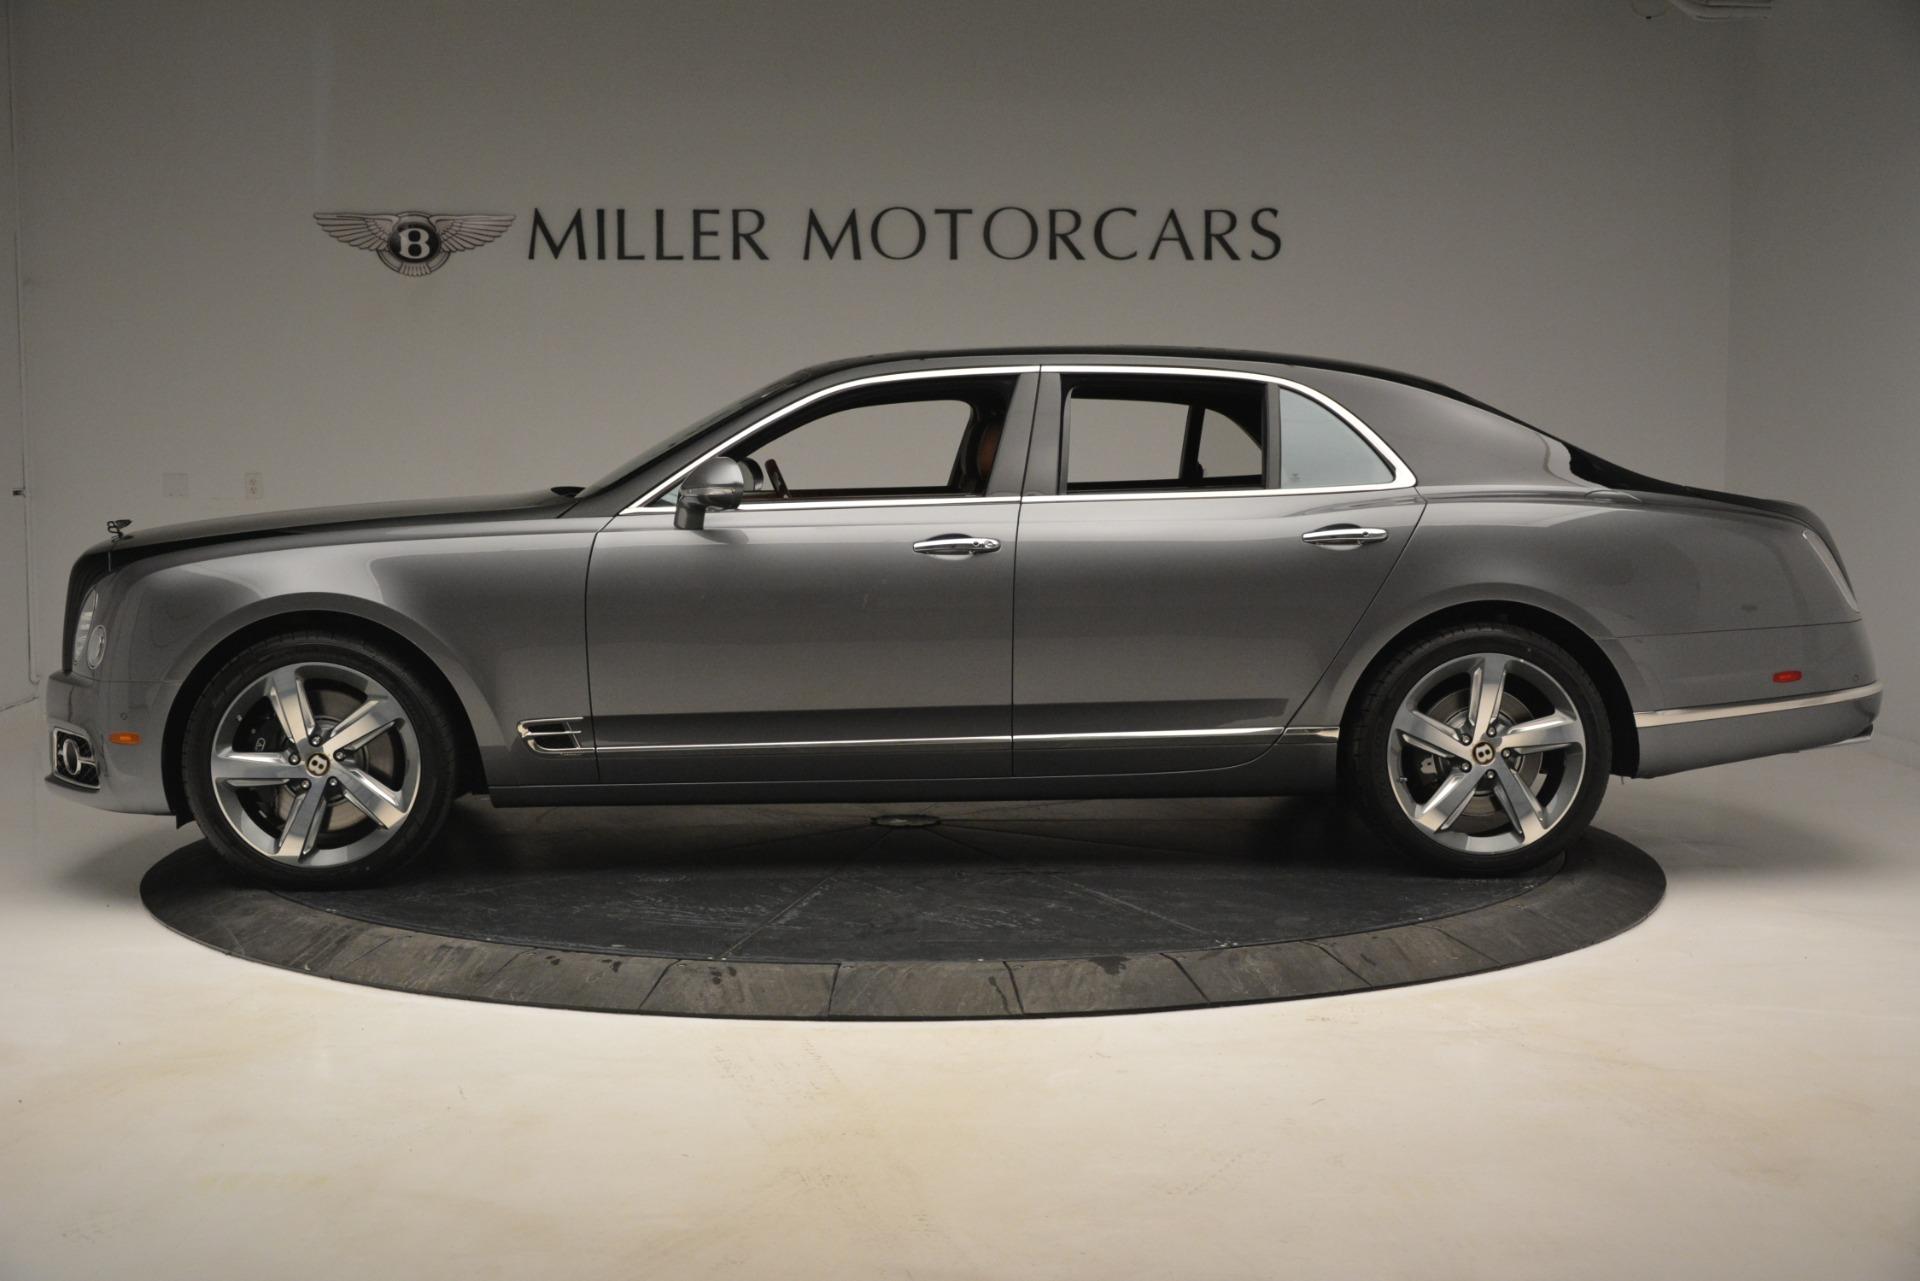 New 2019 Bentley Mulsanne Speed For Sale In Westport, CT 2786_p3